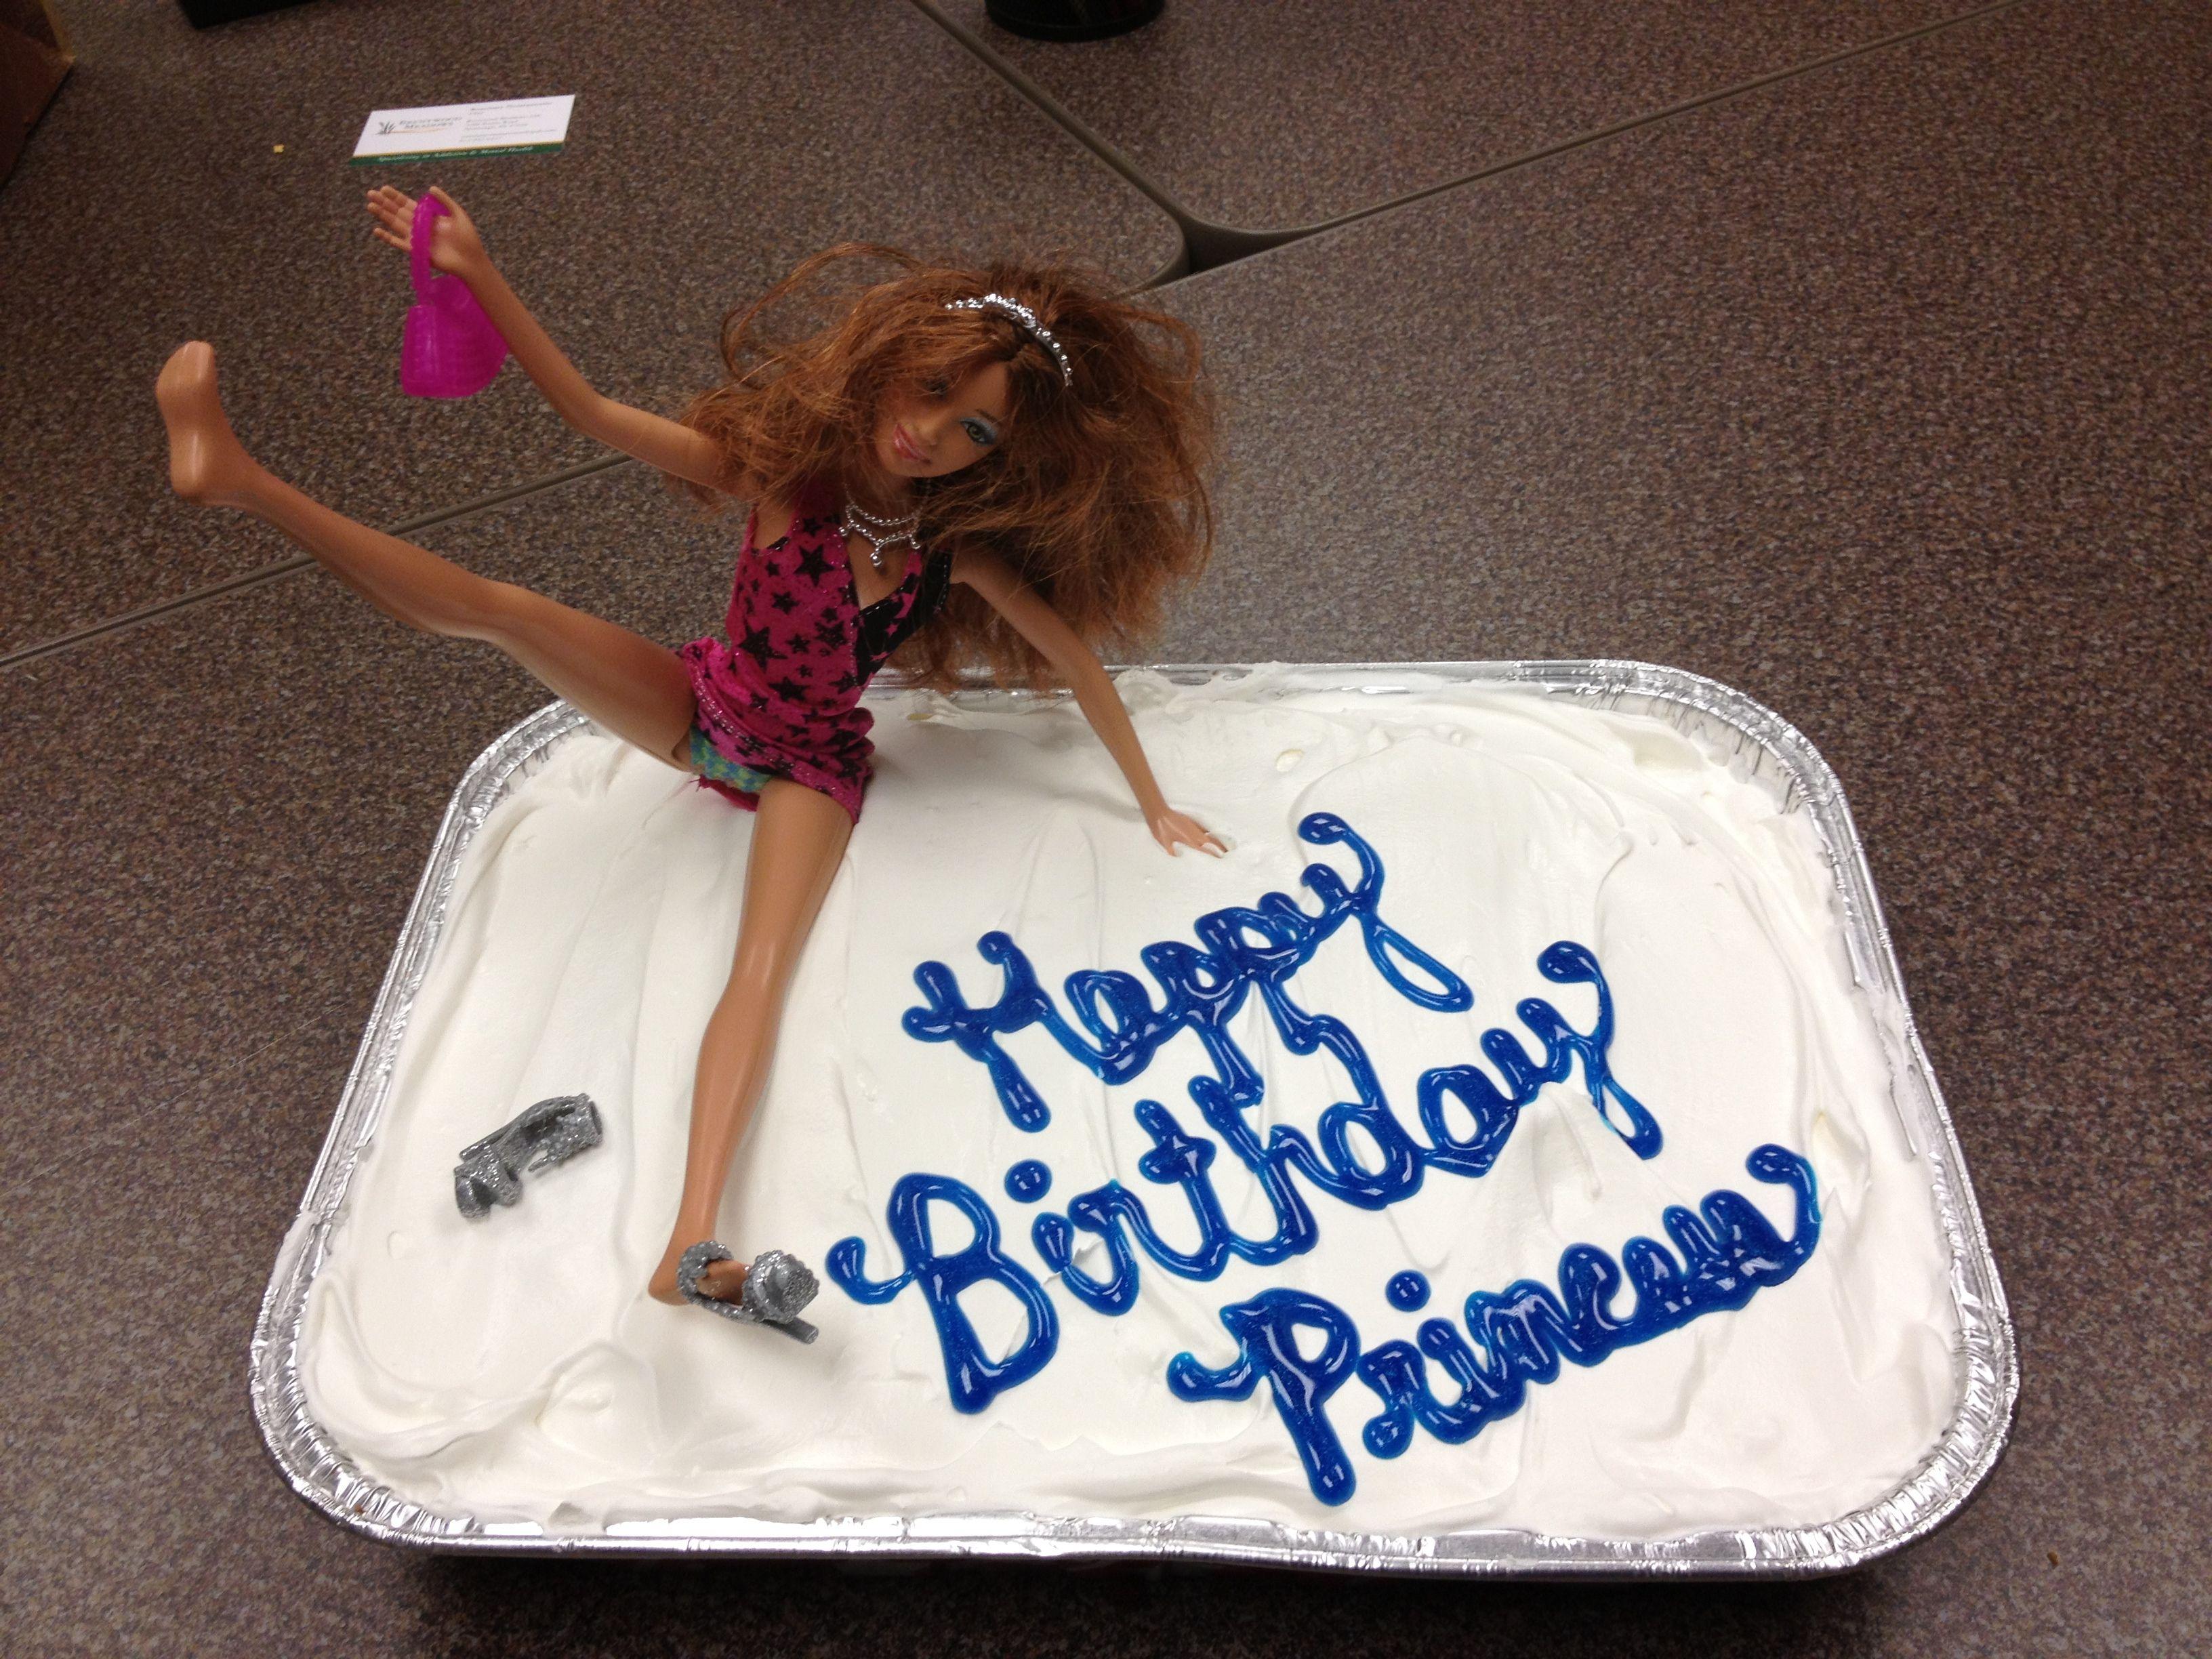 Drunk Barbie Cake for my 22 birthday Flavor Orange Dreamsickle